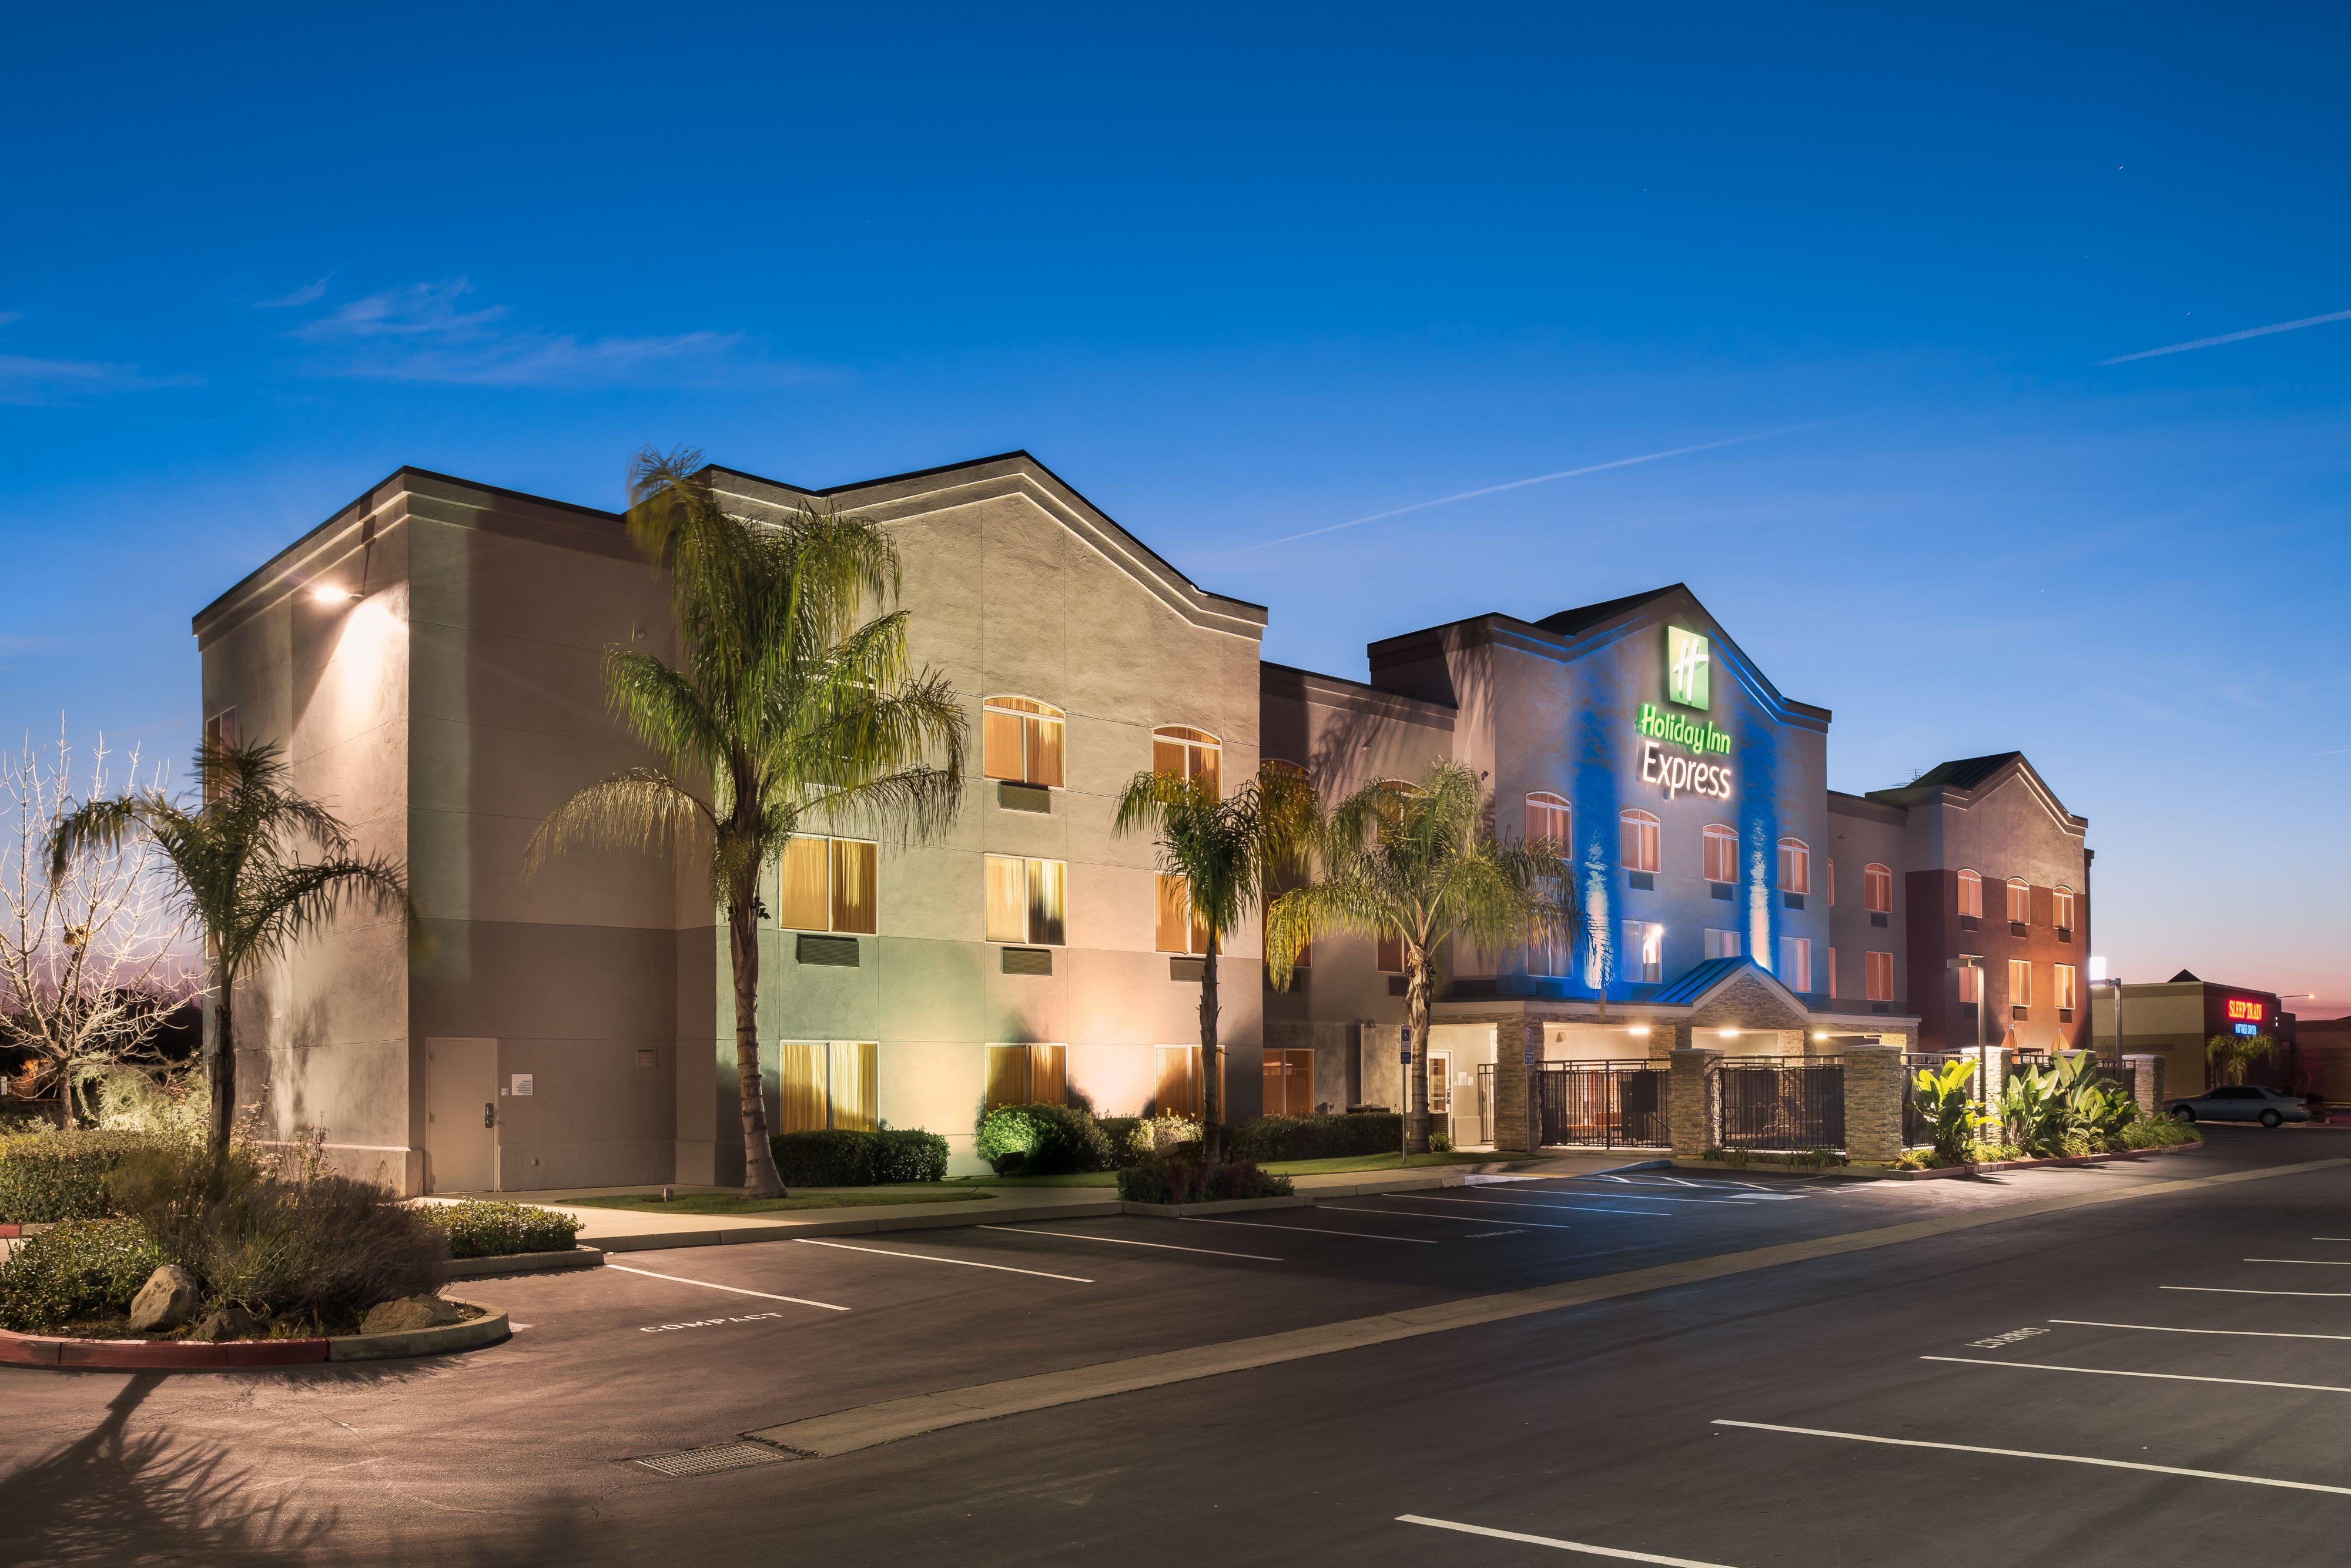 Holiday Inn Express & Suites Rockford-Loves Park image 5